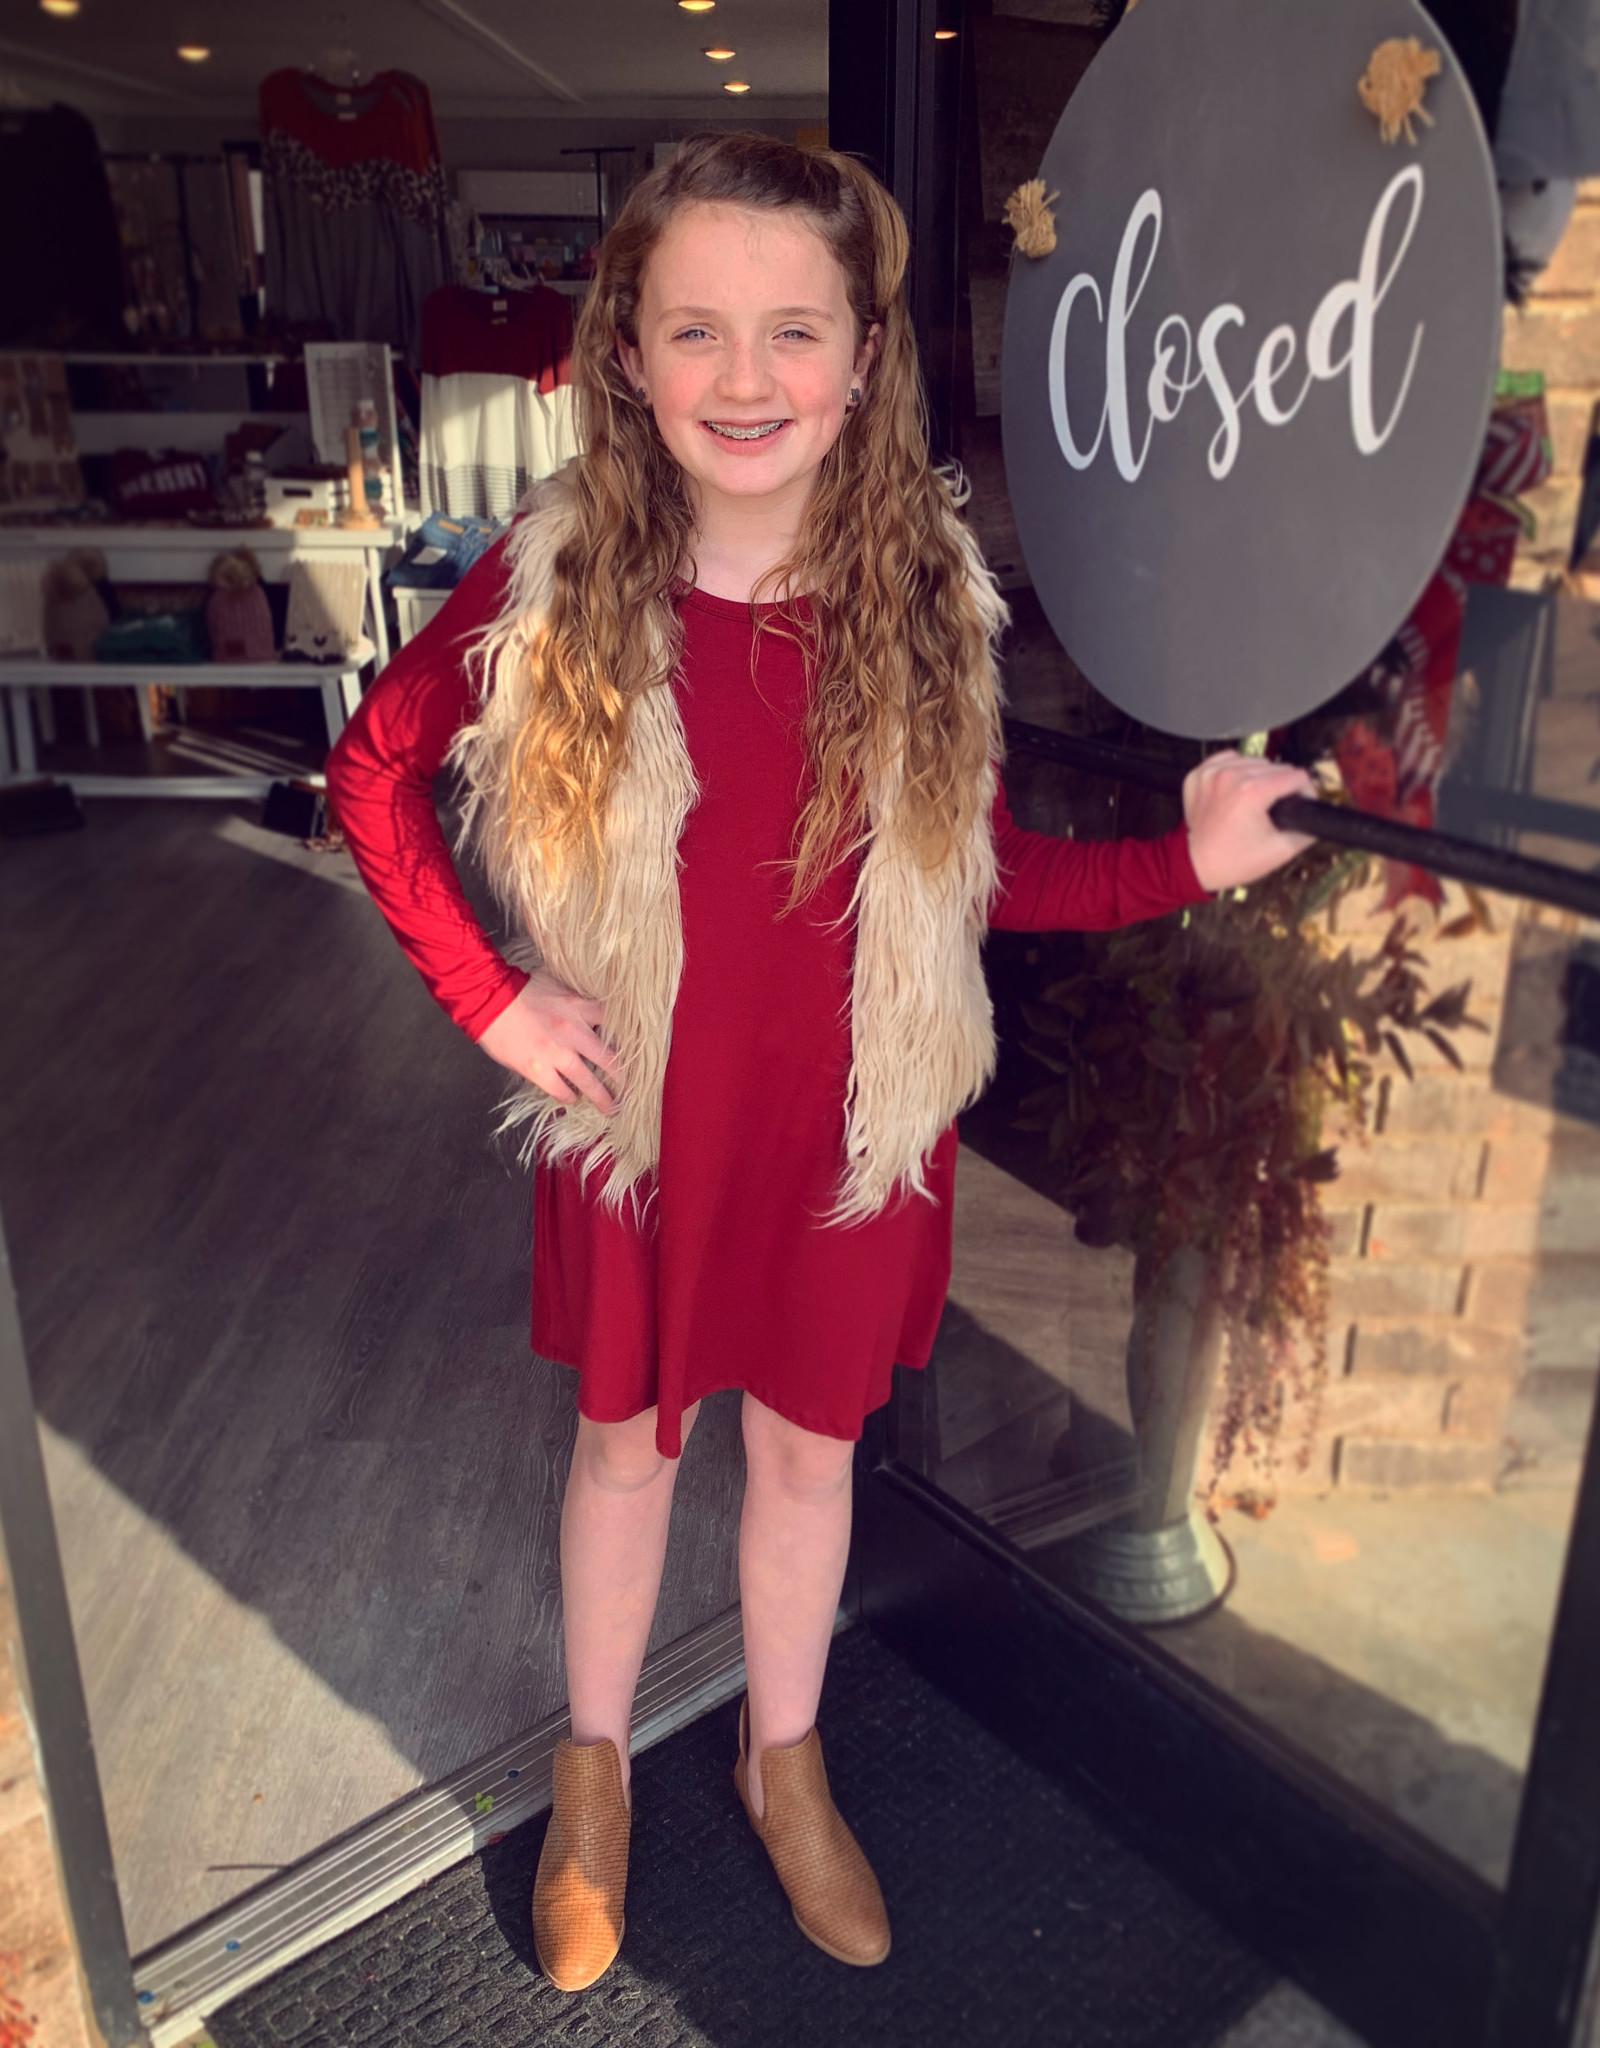 G to G Phoebe Burgundy Swing Dress